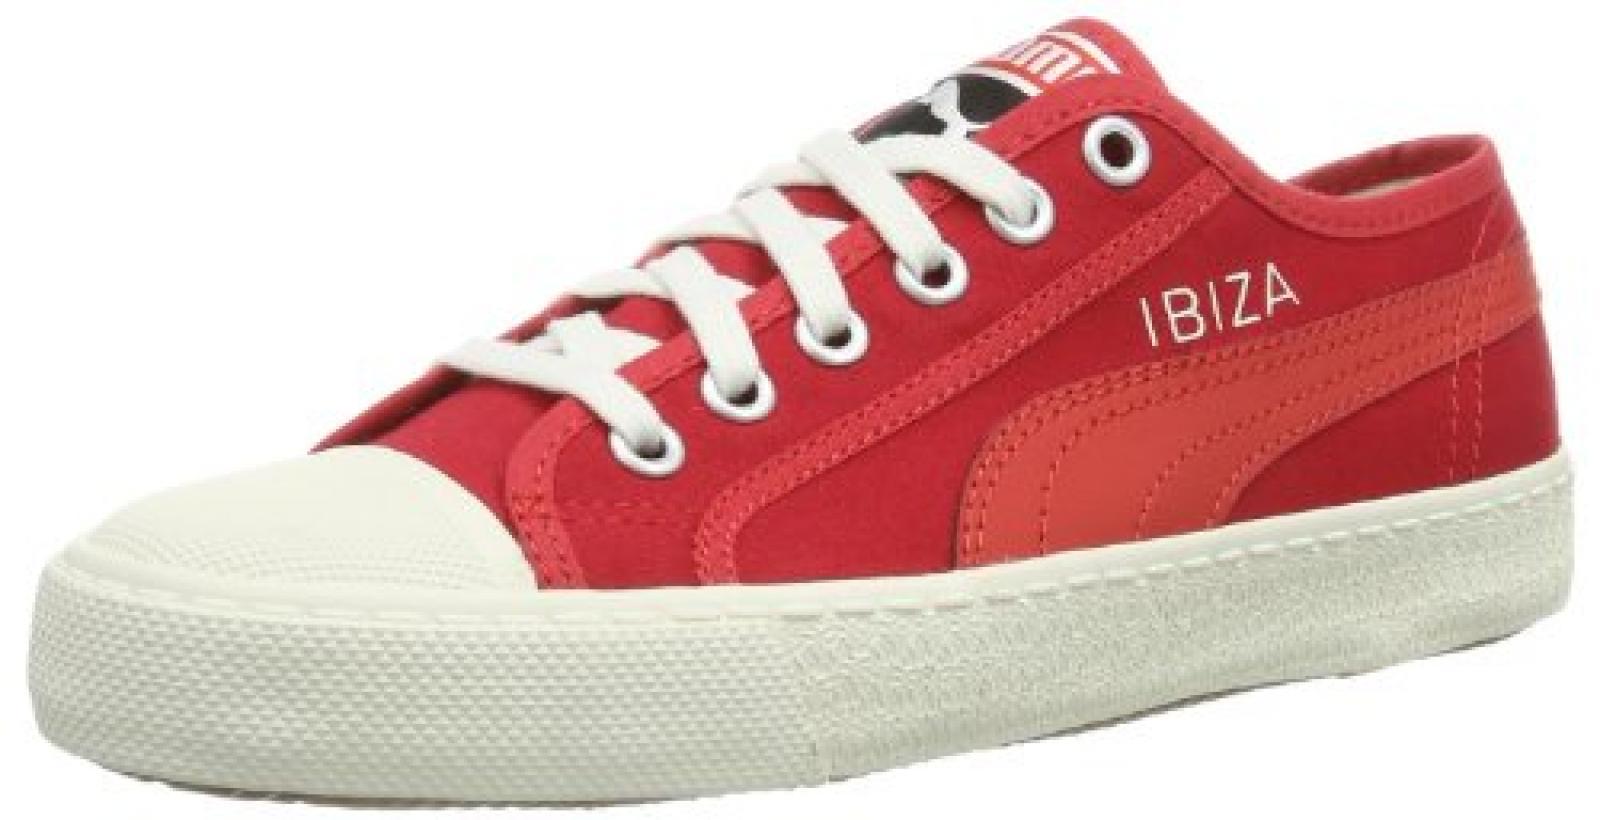 Puma Ibiza NM#1 356533 Unisex-Erwachsene Sneaker